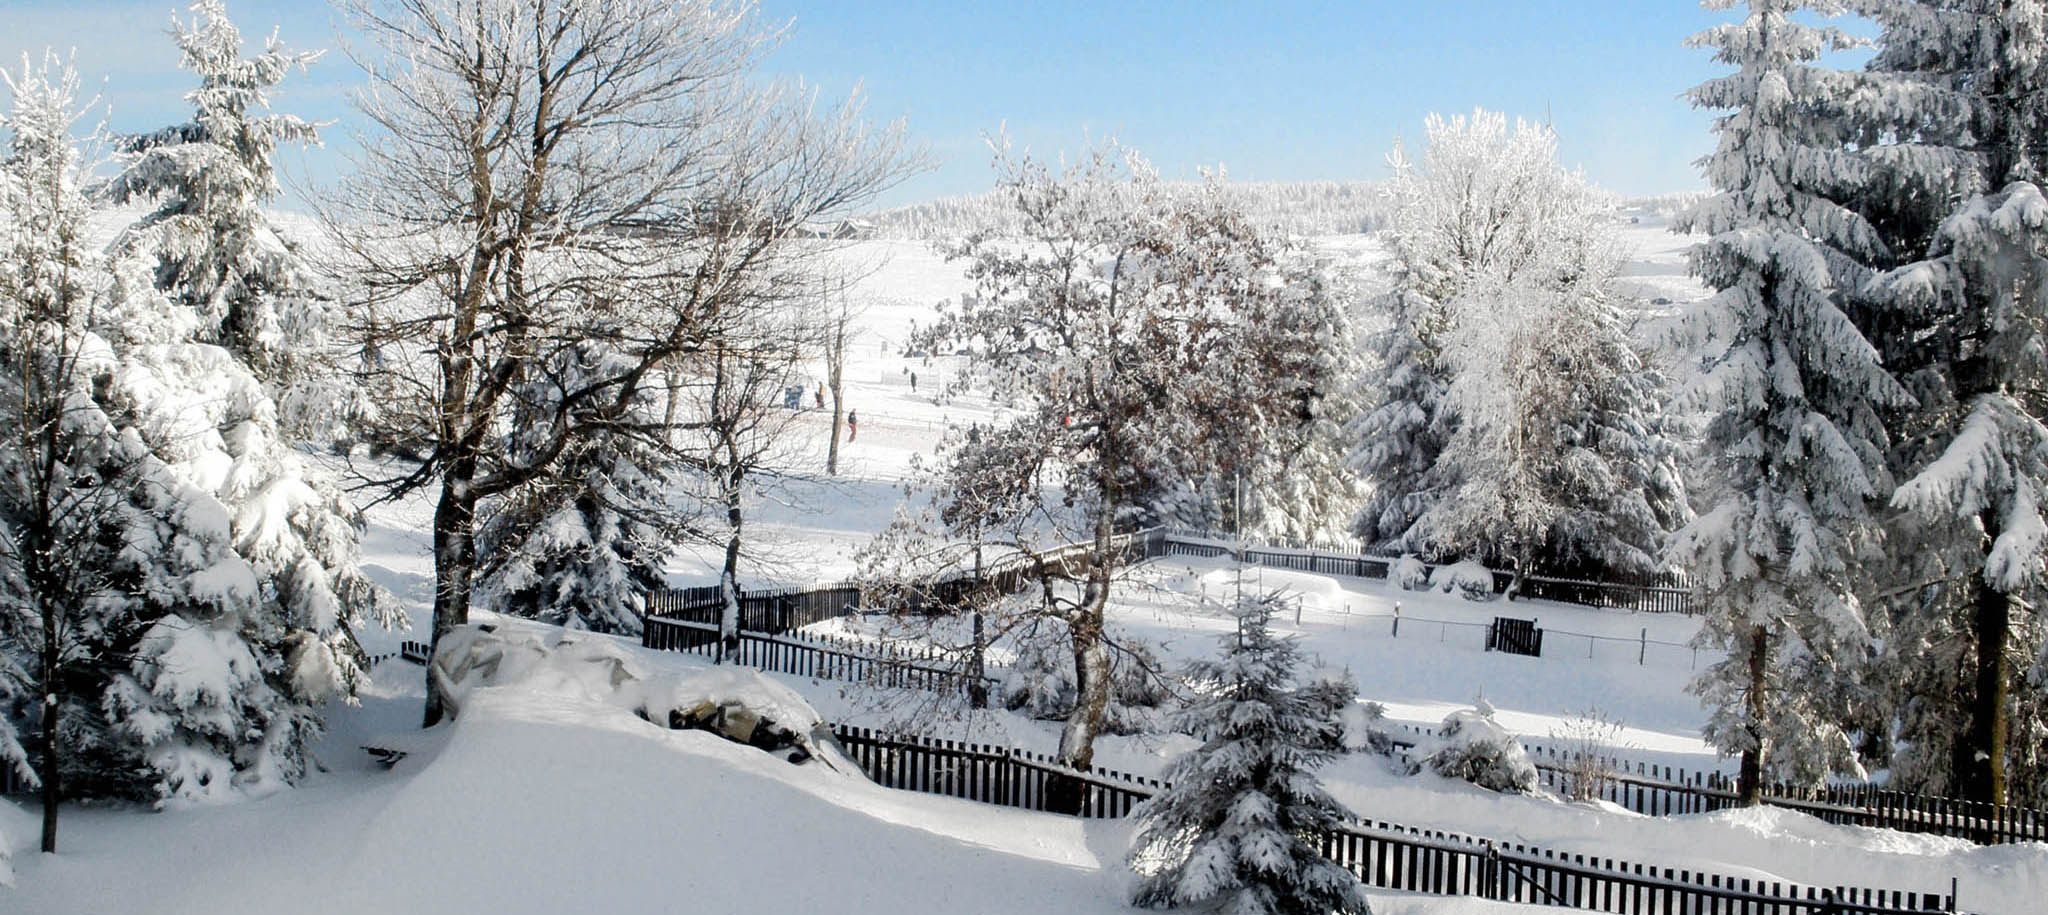 Výhled z apartmánu A8 - Nowako, směr Ježíškova cesta